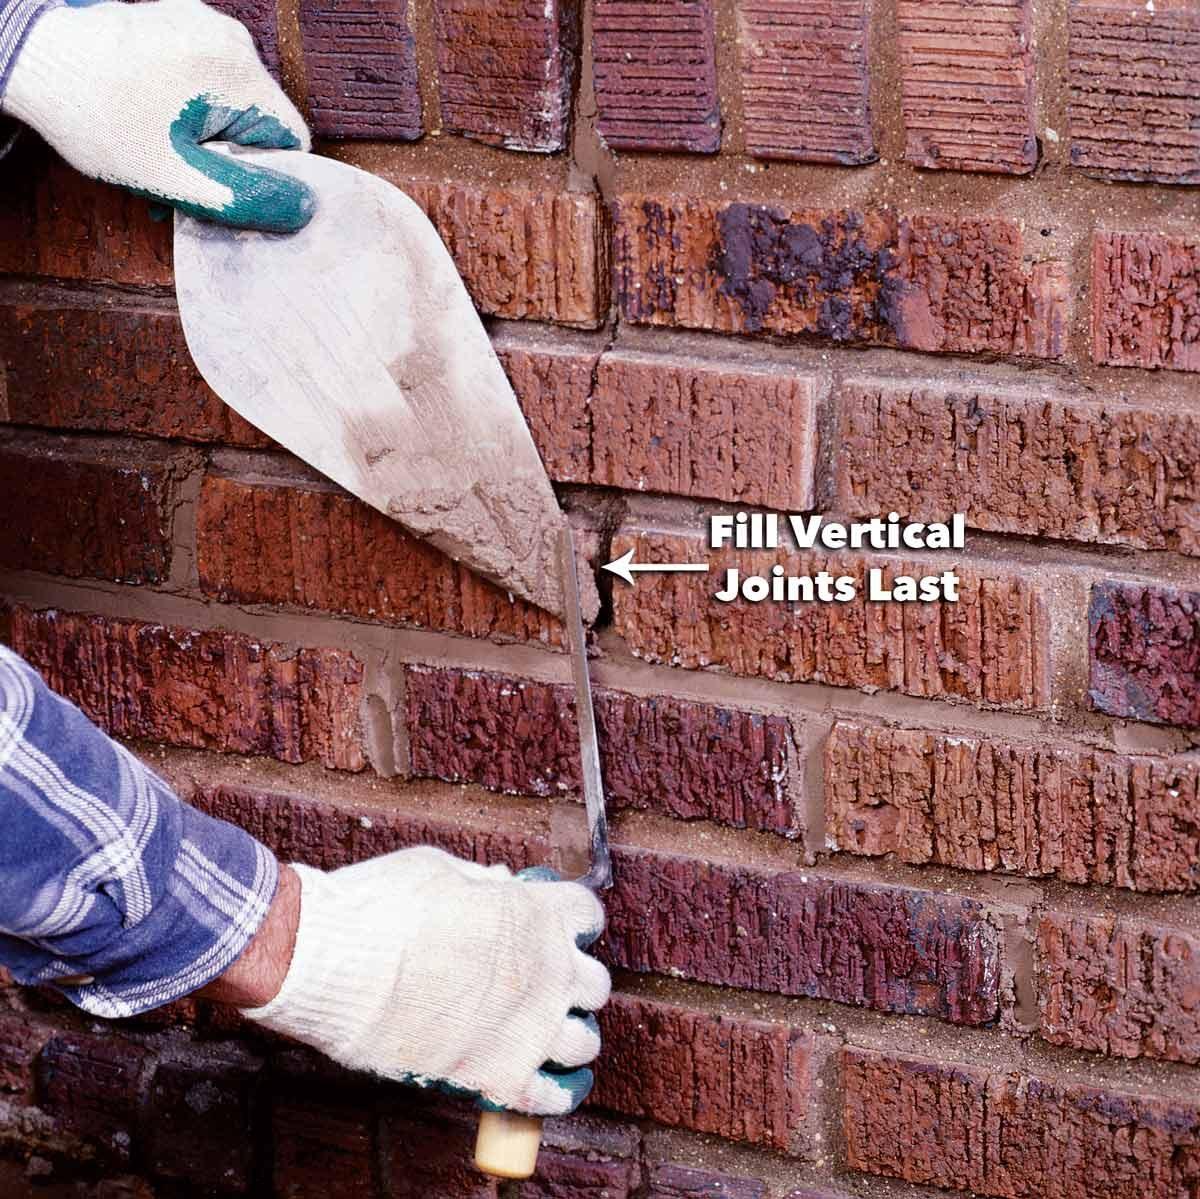 fill vertical mortar joints last